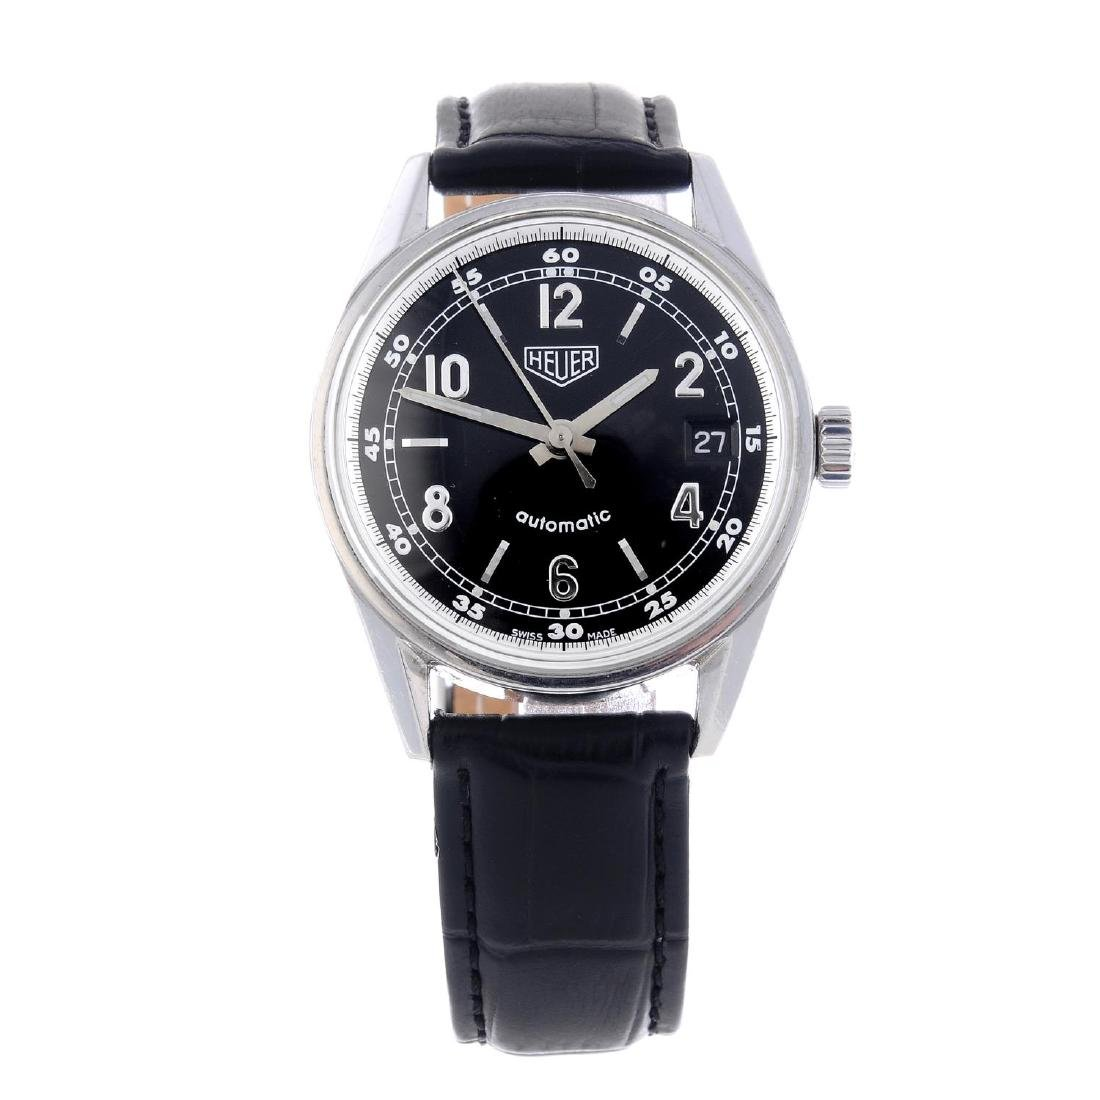 TAG HEUER - a gentleman's Carrera Re-Edition wrist